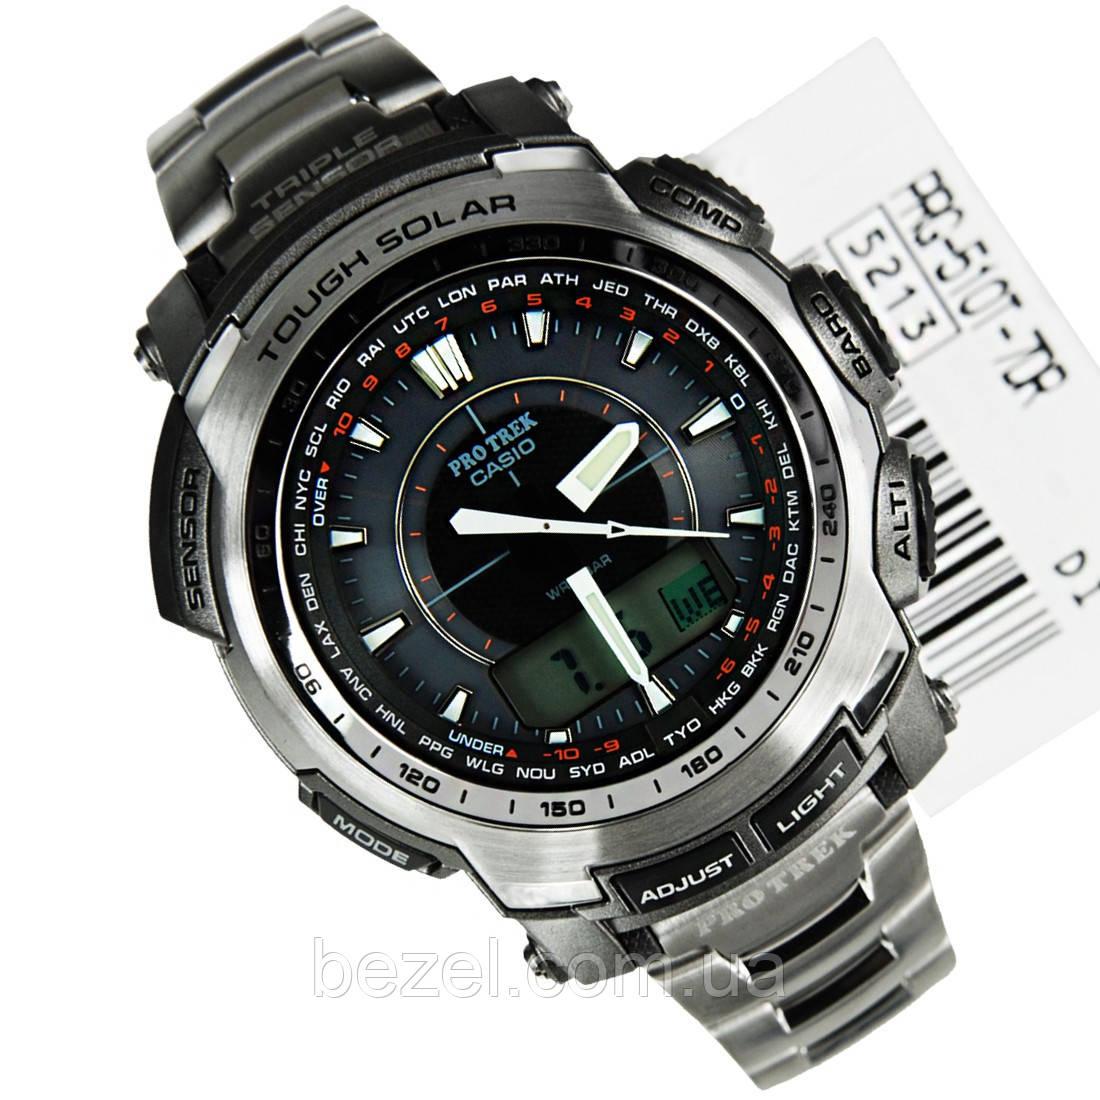 Мужские часы Casio Protrek PRG-510T-7 Solar Titanium   продажа e6fe49a0fcf3